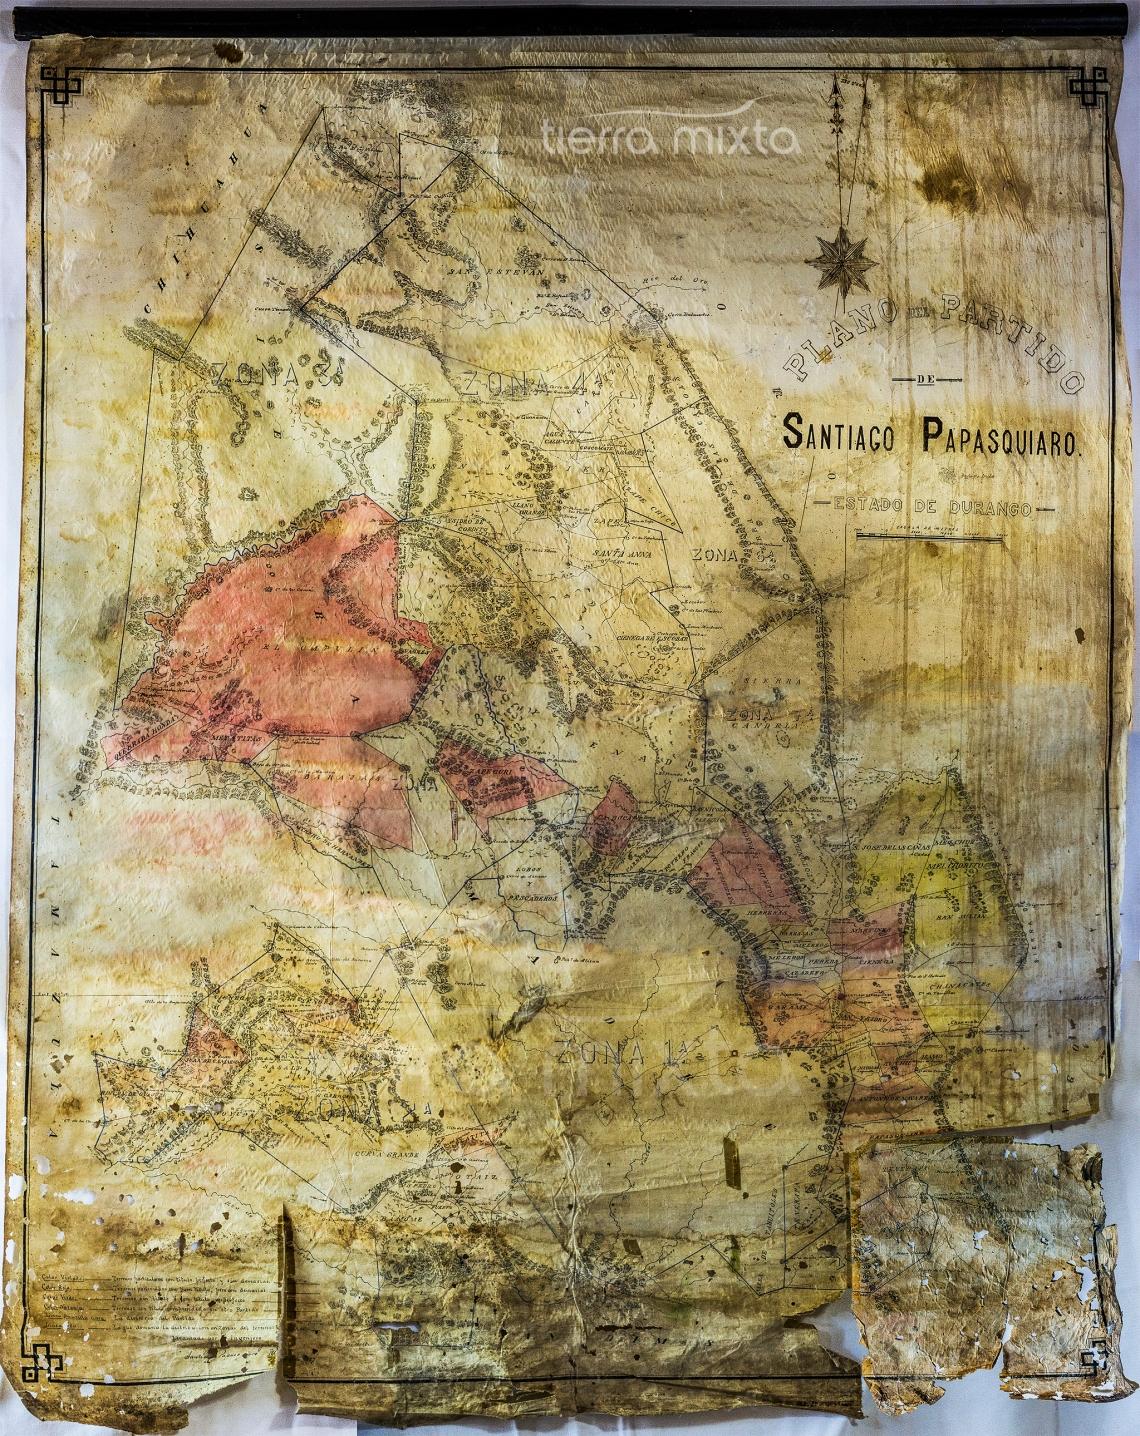 Mapa Santiago Papasquiaro _ 1887 _ Tierra Mixta - José Guadalupe Porras _ Cristian Herrera _ Durango